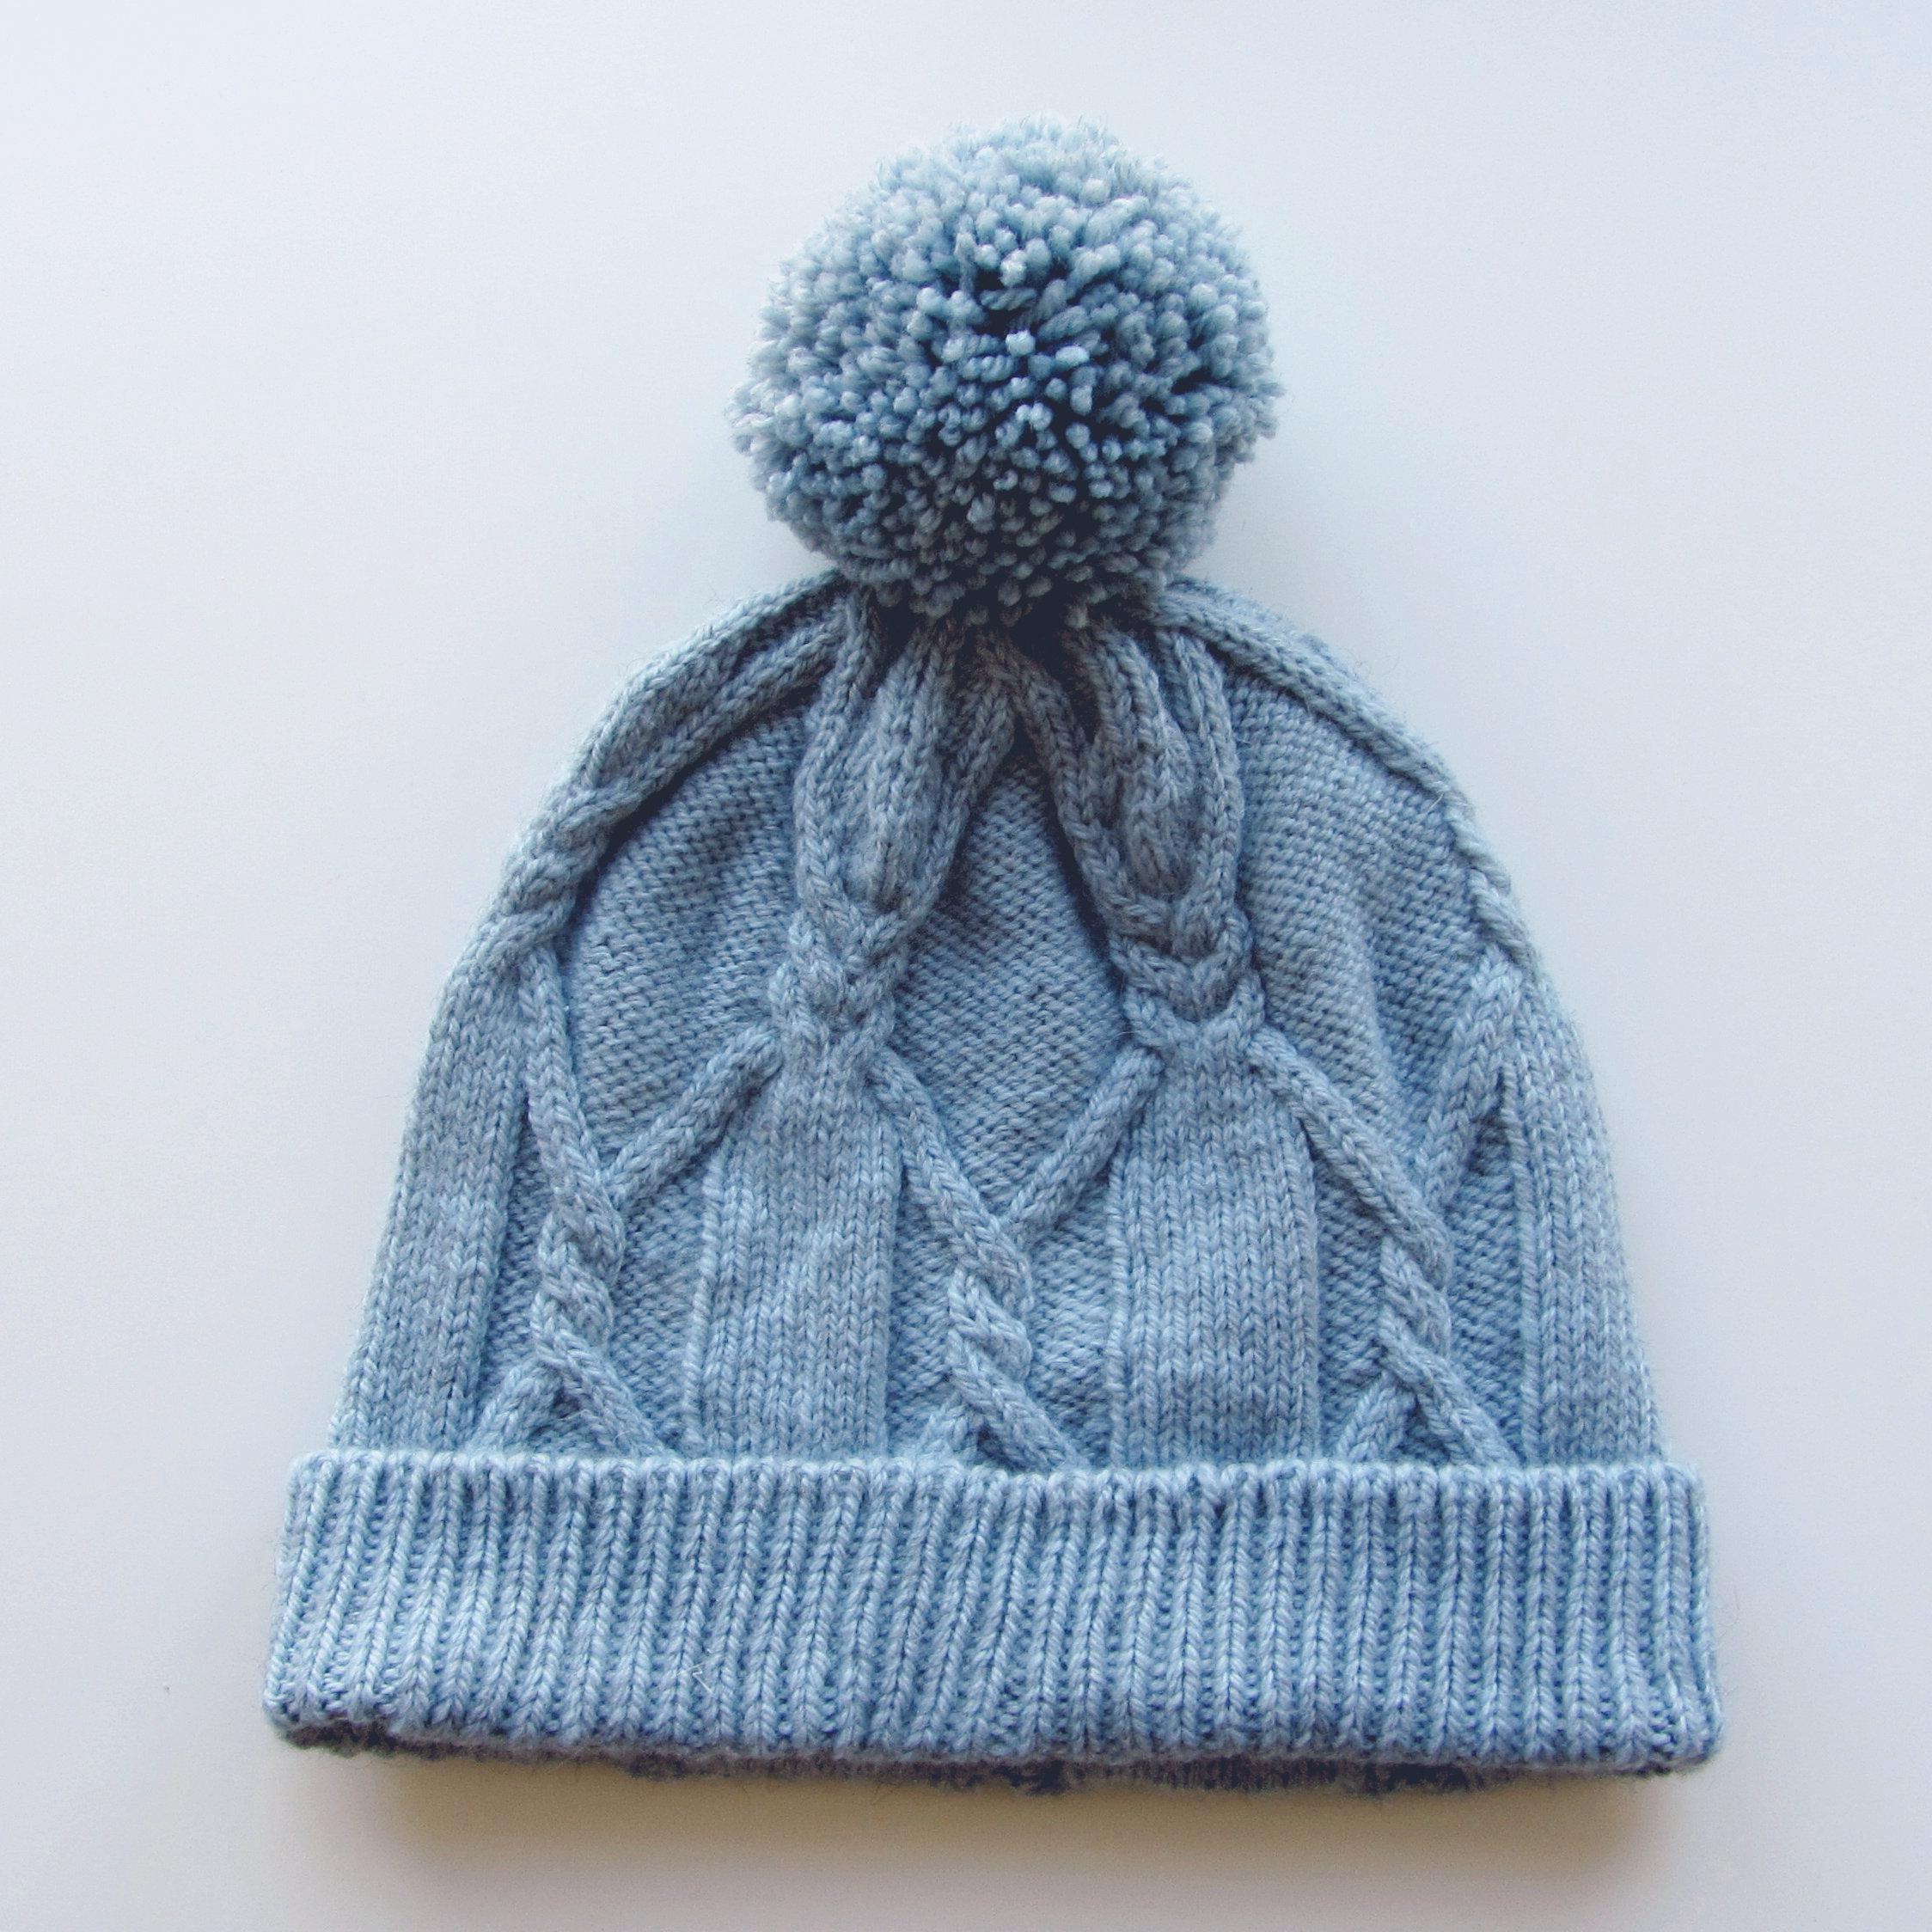 Free Knitting Pattern - Rilo Hat